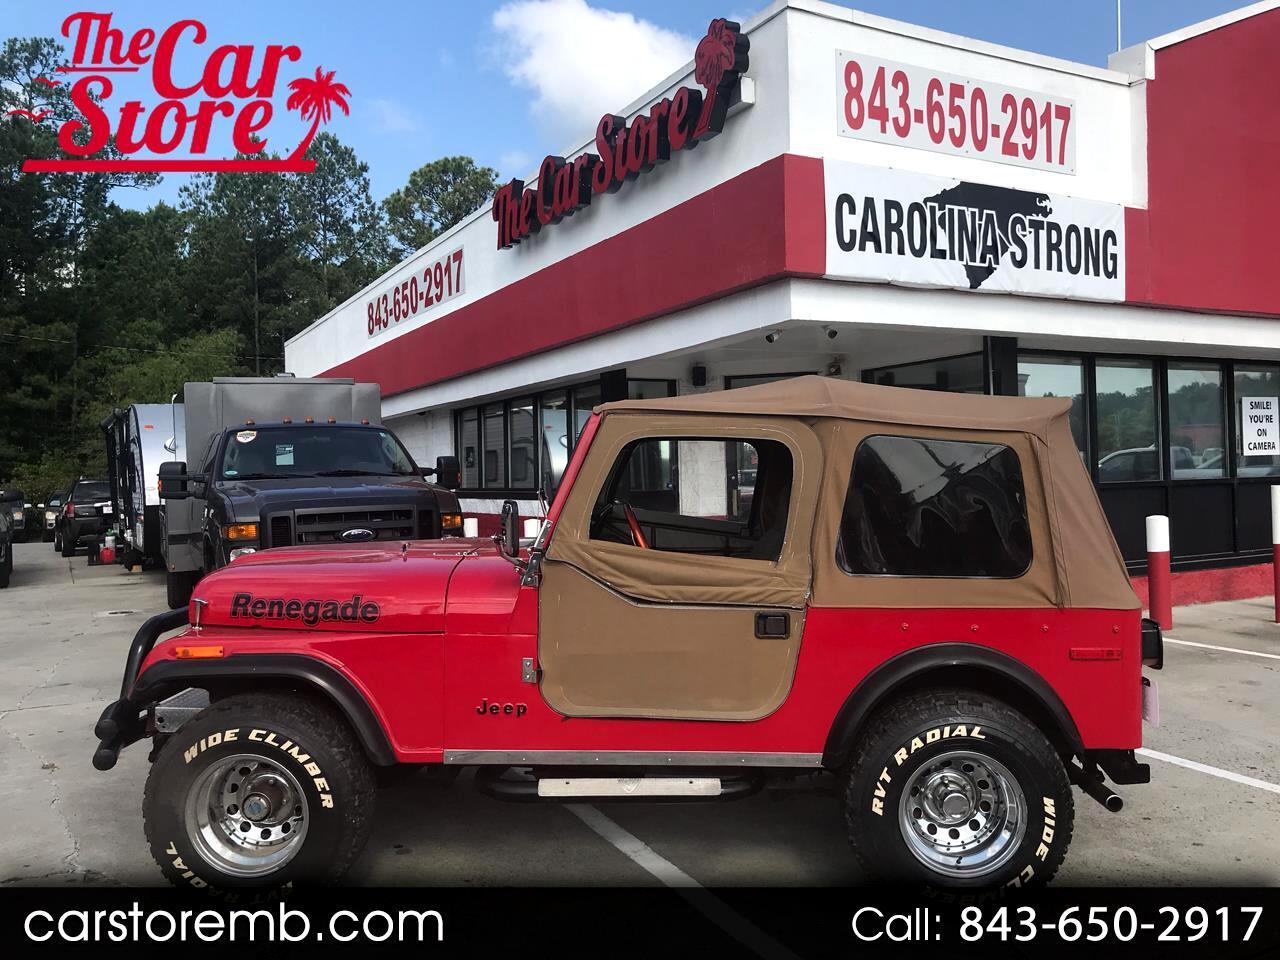 1978 Jeep CJ-7 Renegade